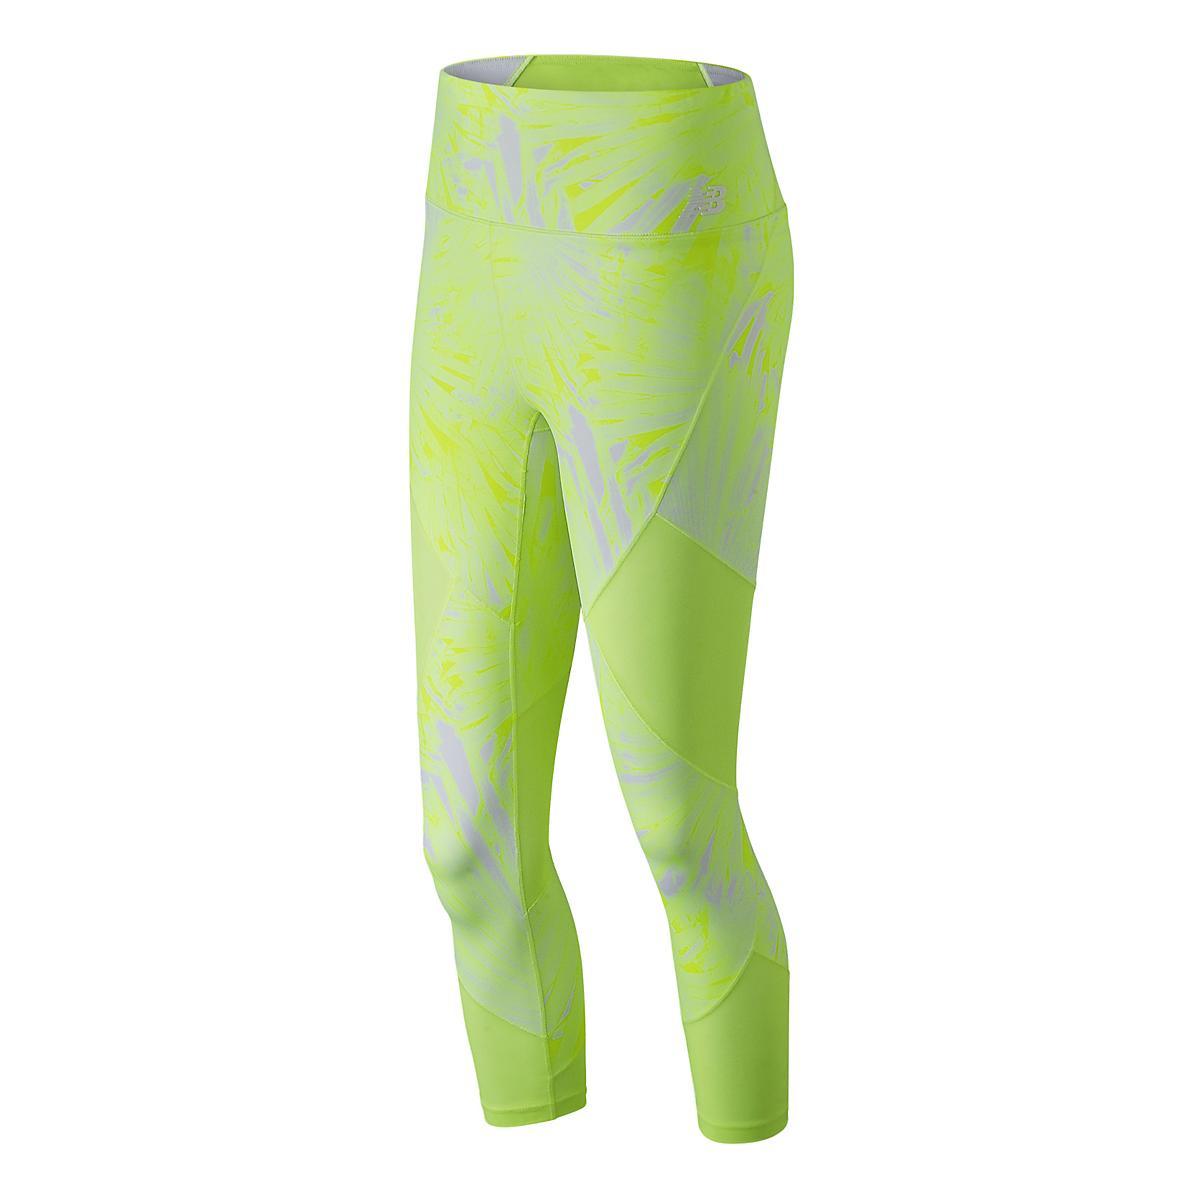 c1cb31d4f2ecd Womens New Balance Printed Feel The Cool Crop Pants at Road Runner Sports